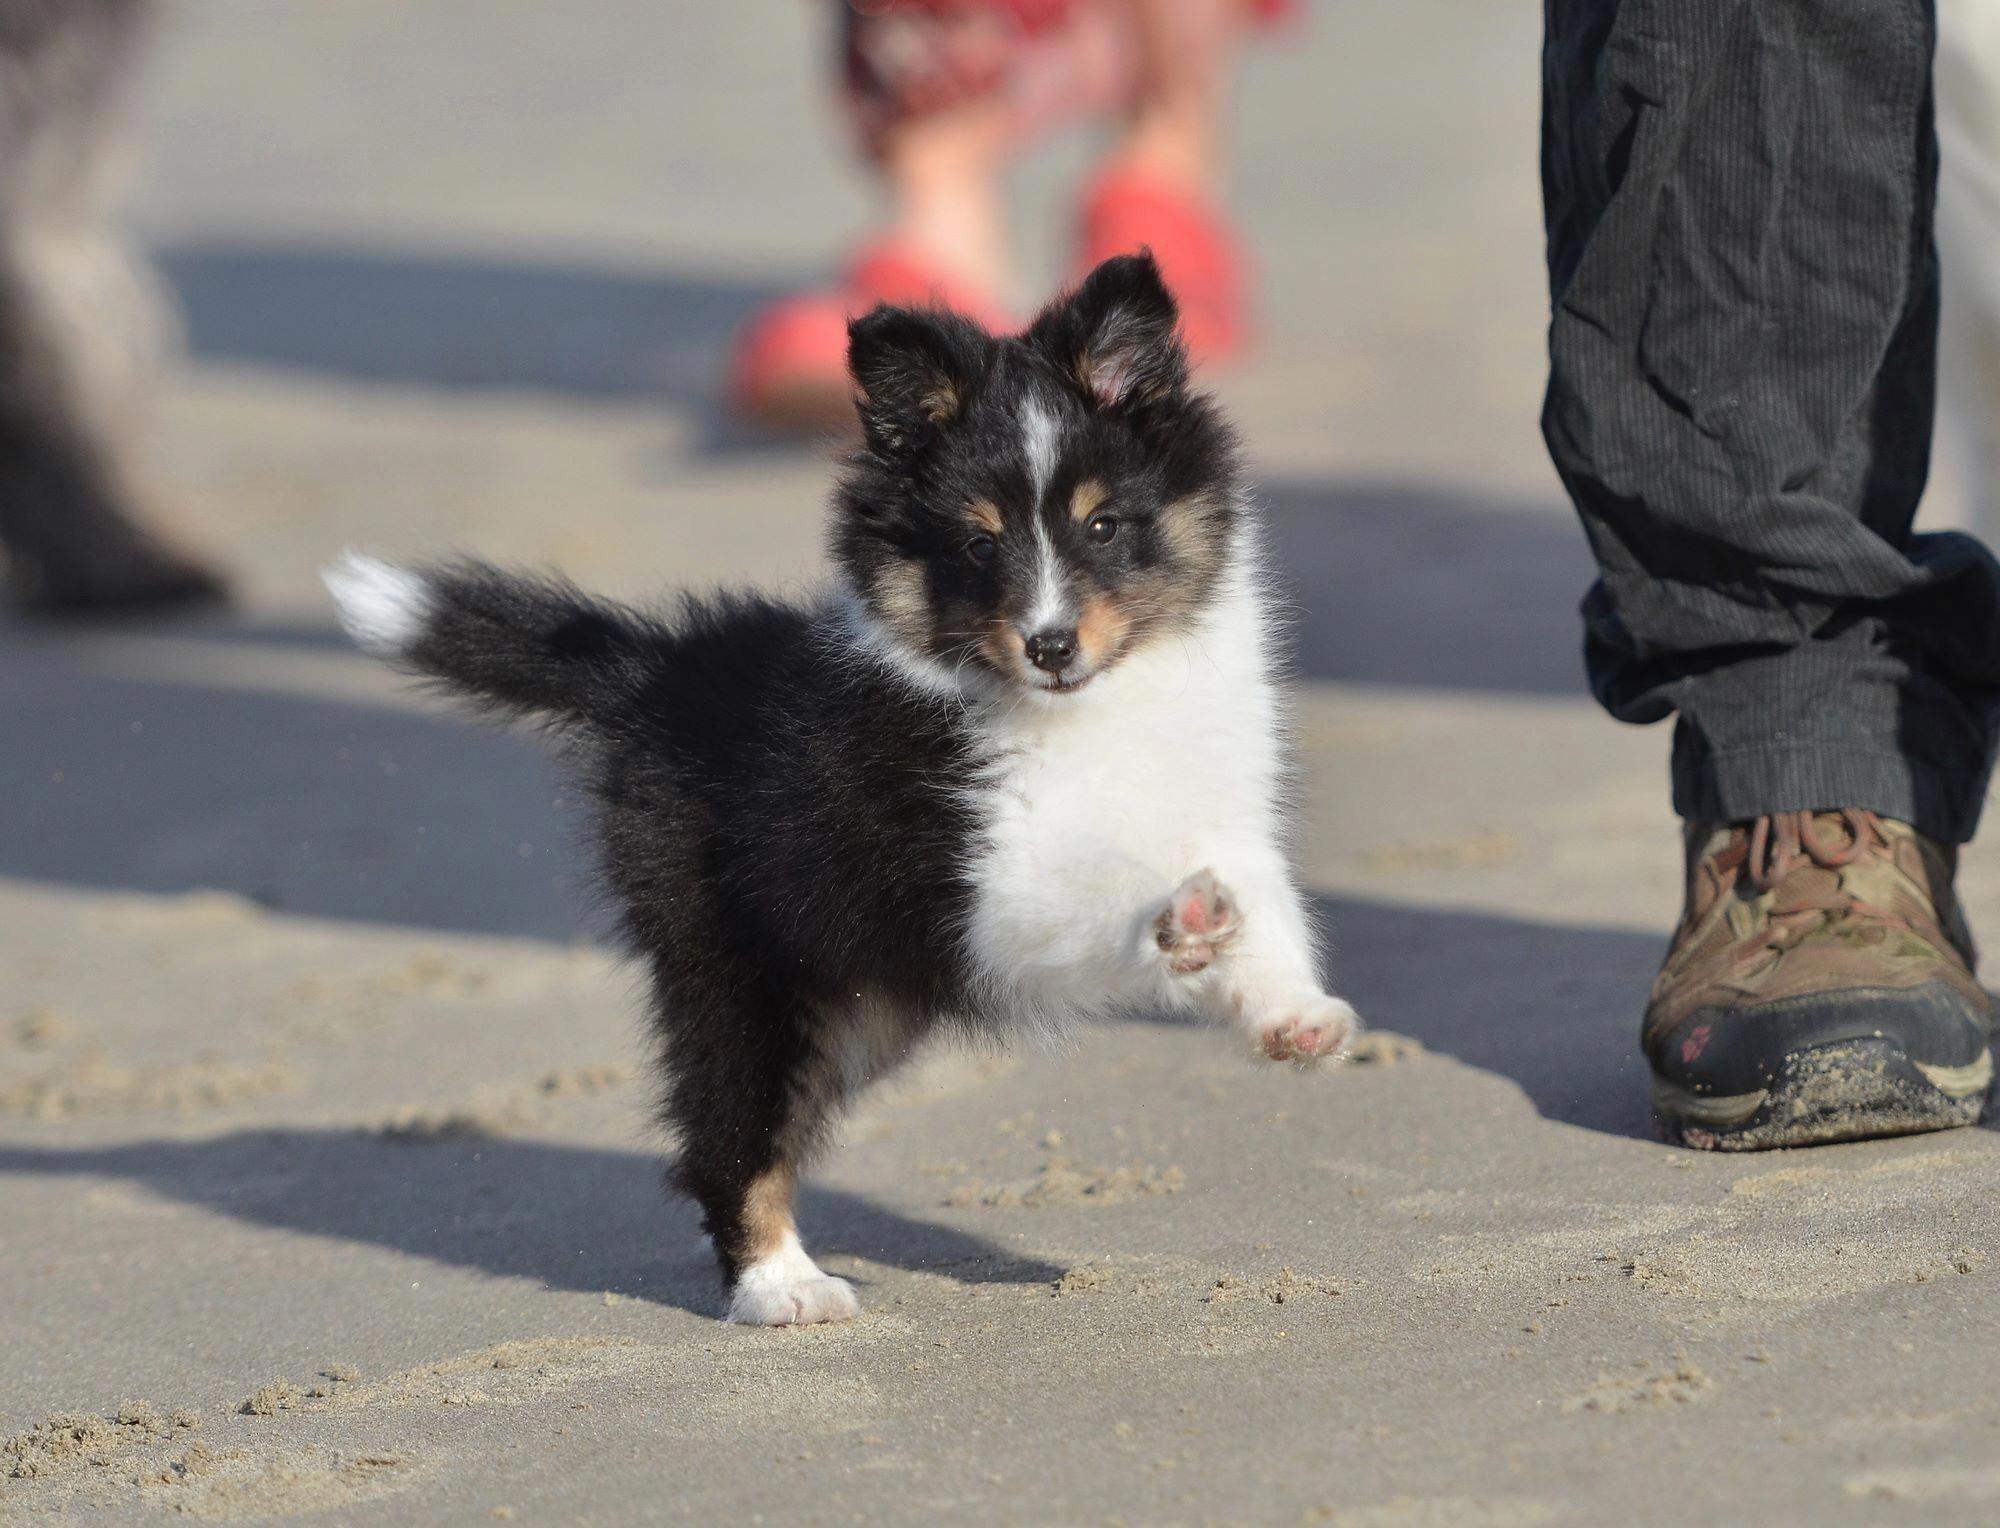 Discover Shetland Sheepdog Puppy Size Shetlandsheepdogs Shetlandsheepdogvalp Shetlandsheepdog Lover Sheep Dog Puppy Shetland Sheepdog Puppies Sheltie Puppy